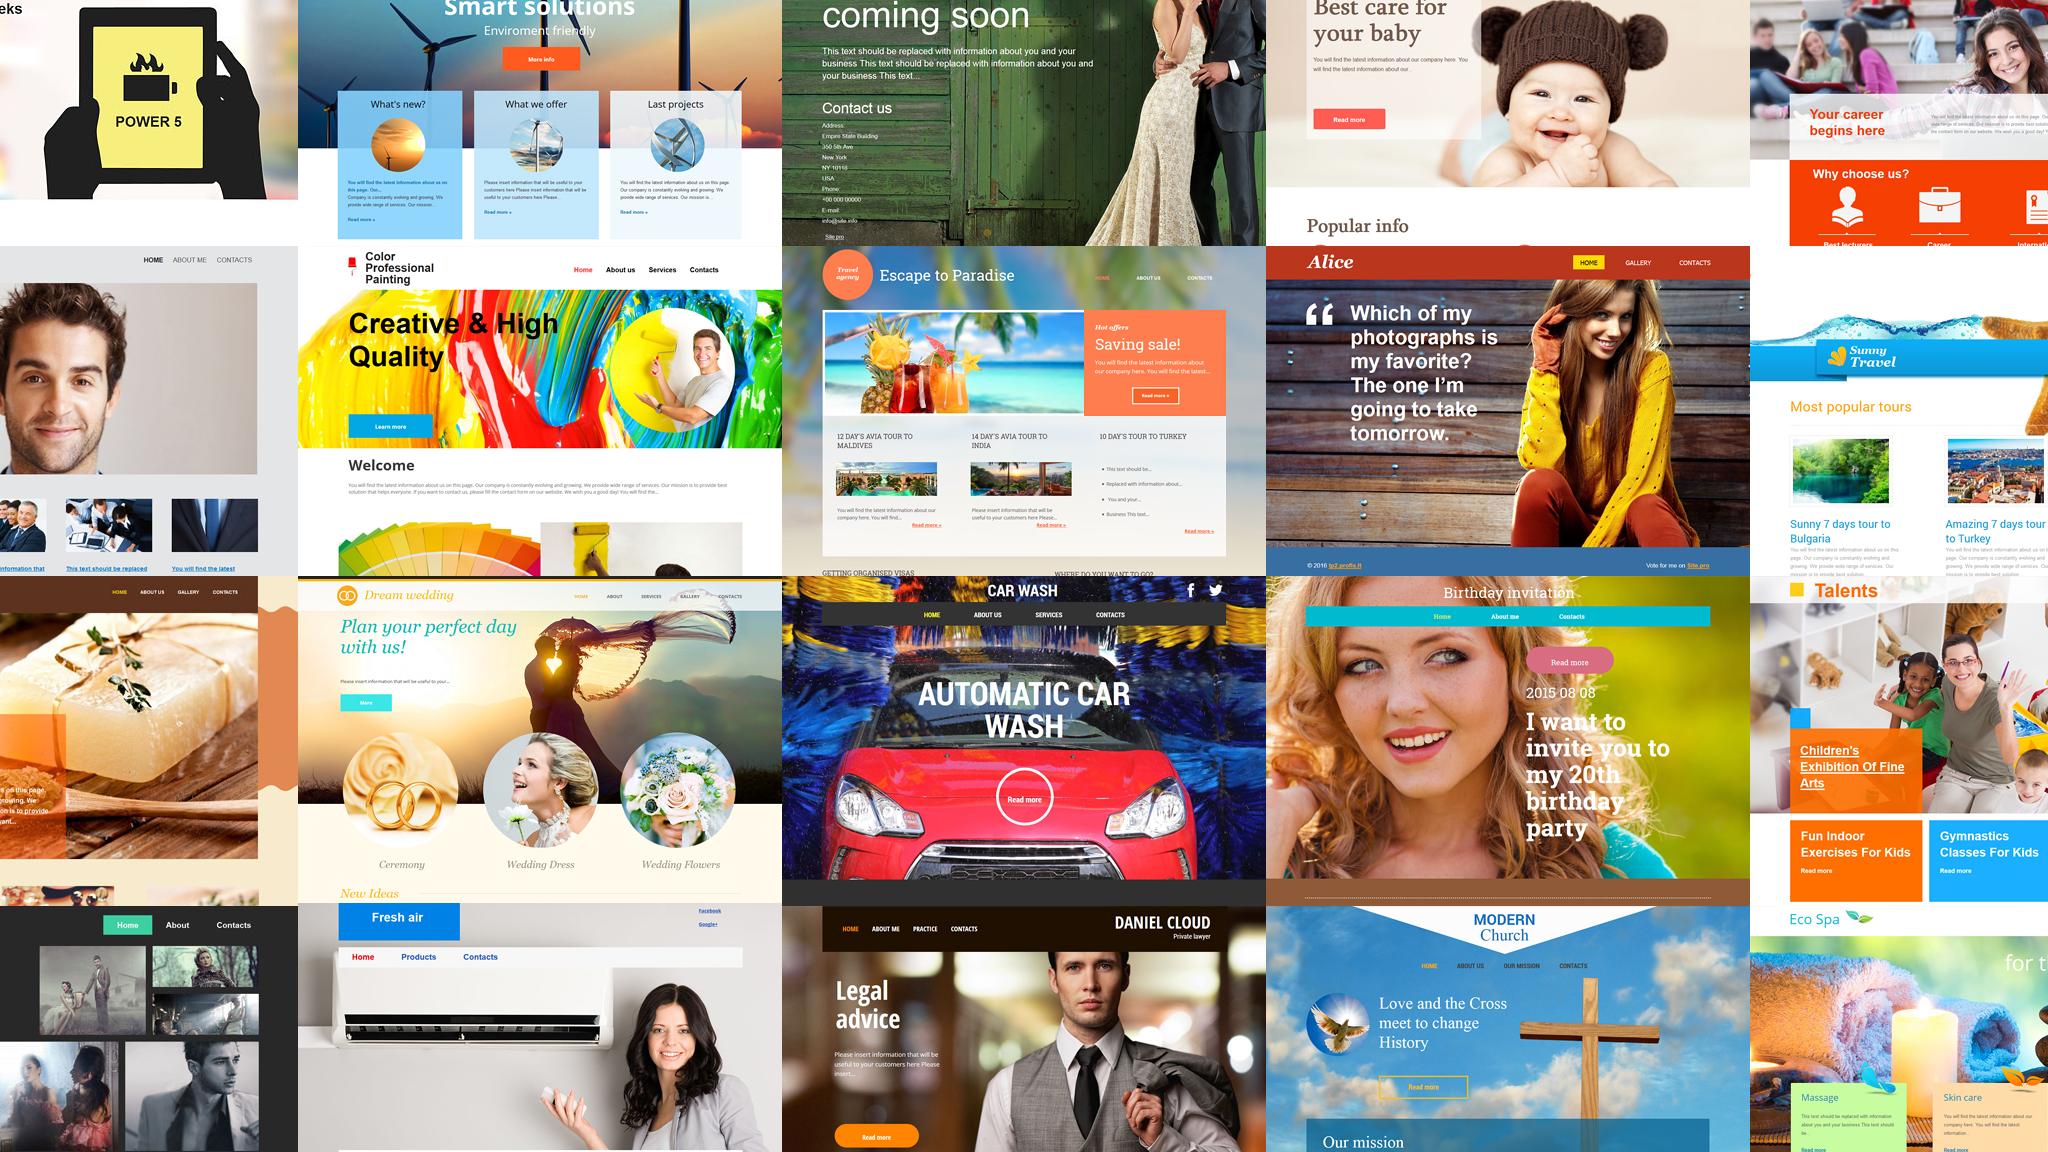 da7d1d583 Zooming – Hospedagem Profissional de Sites e Email